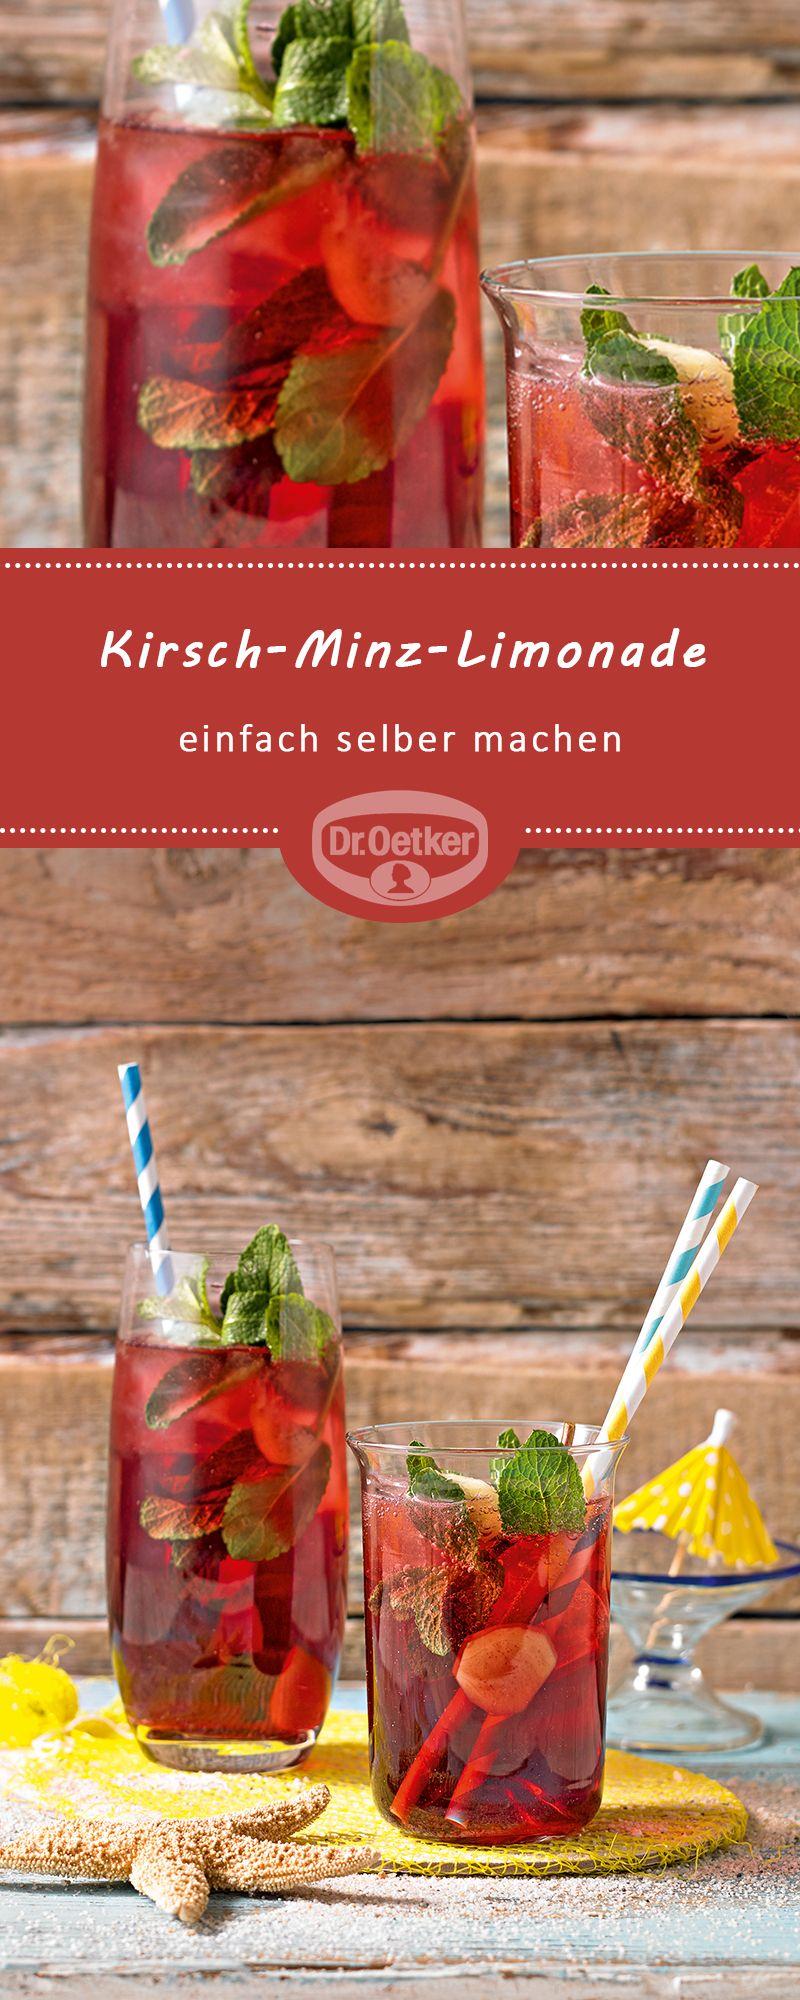 Photo of Kirsebær-mynte-limonade